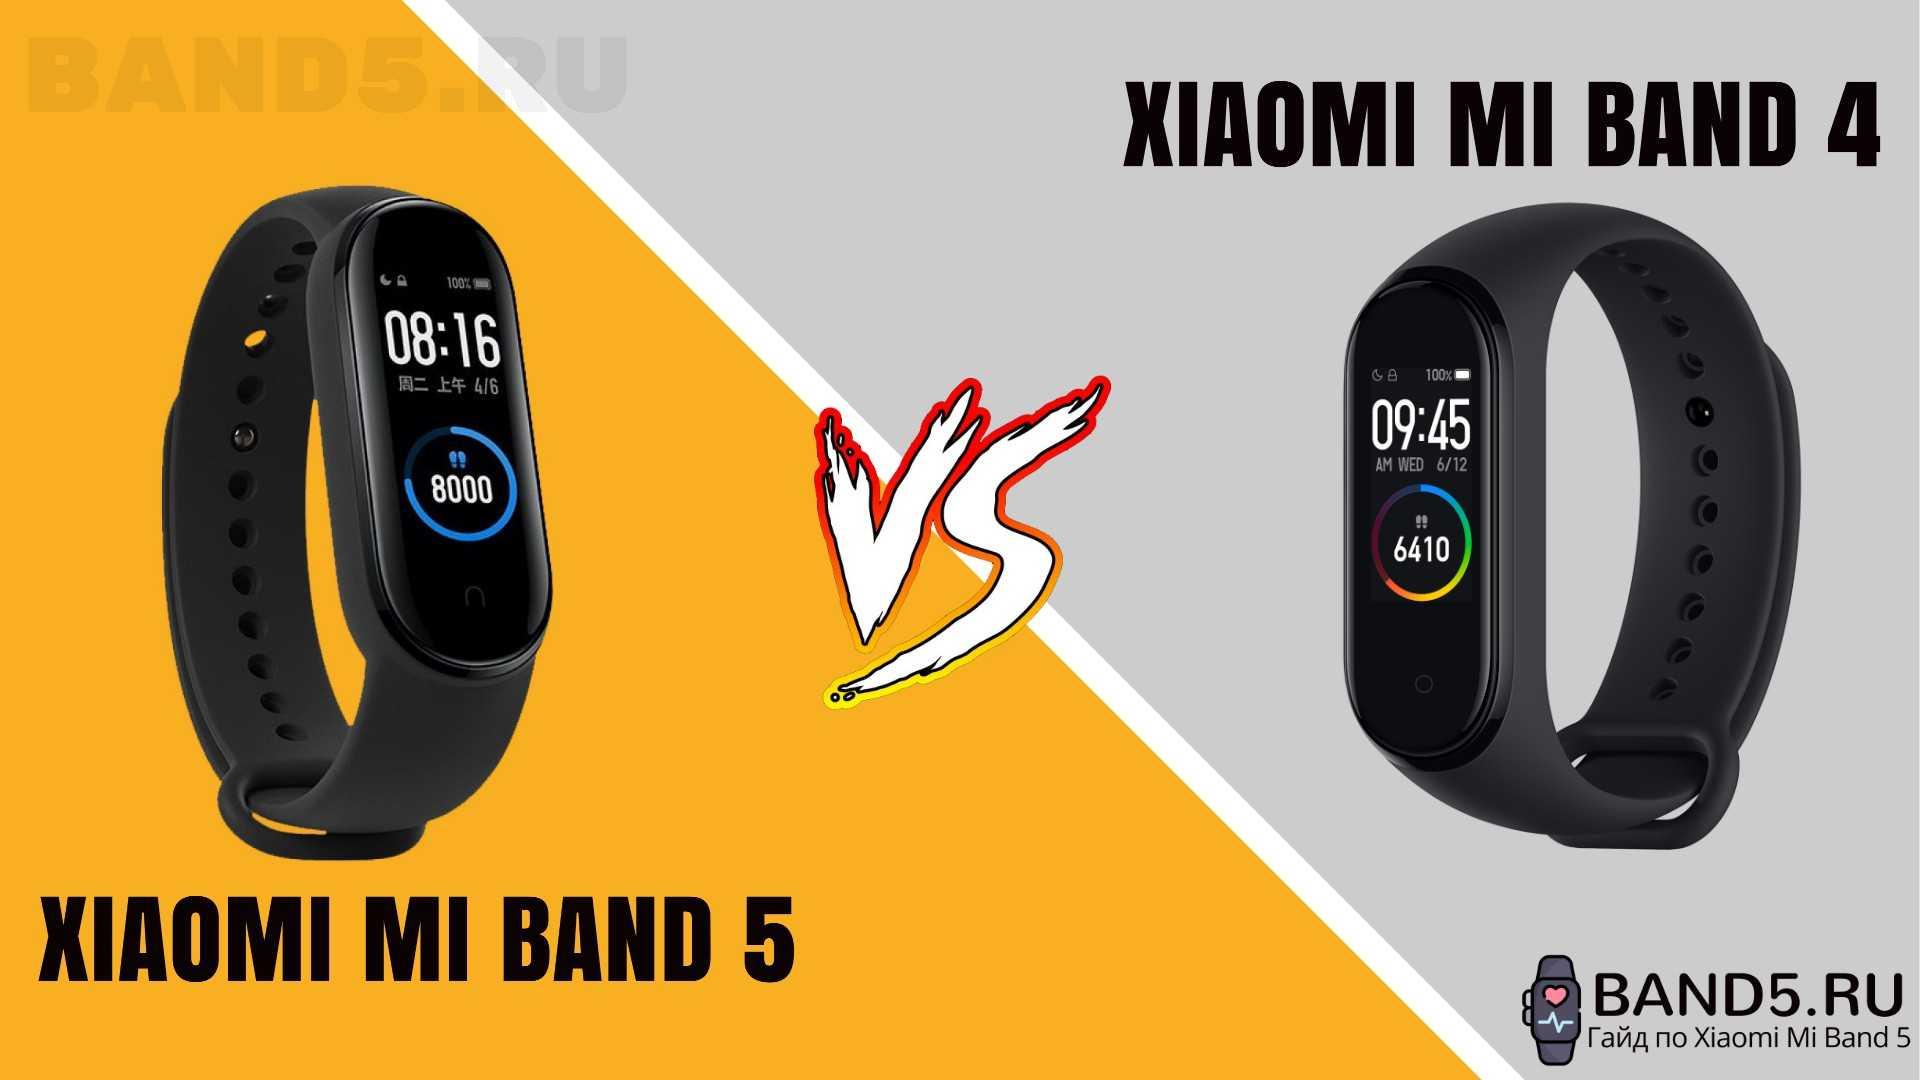 Фитнес браслет huami amazfit band 5 — обзор трекера в сравнении с xiaomi mi smart band 5 - вайфайка.ру